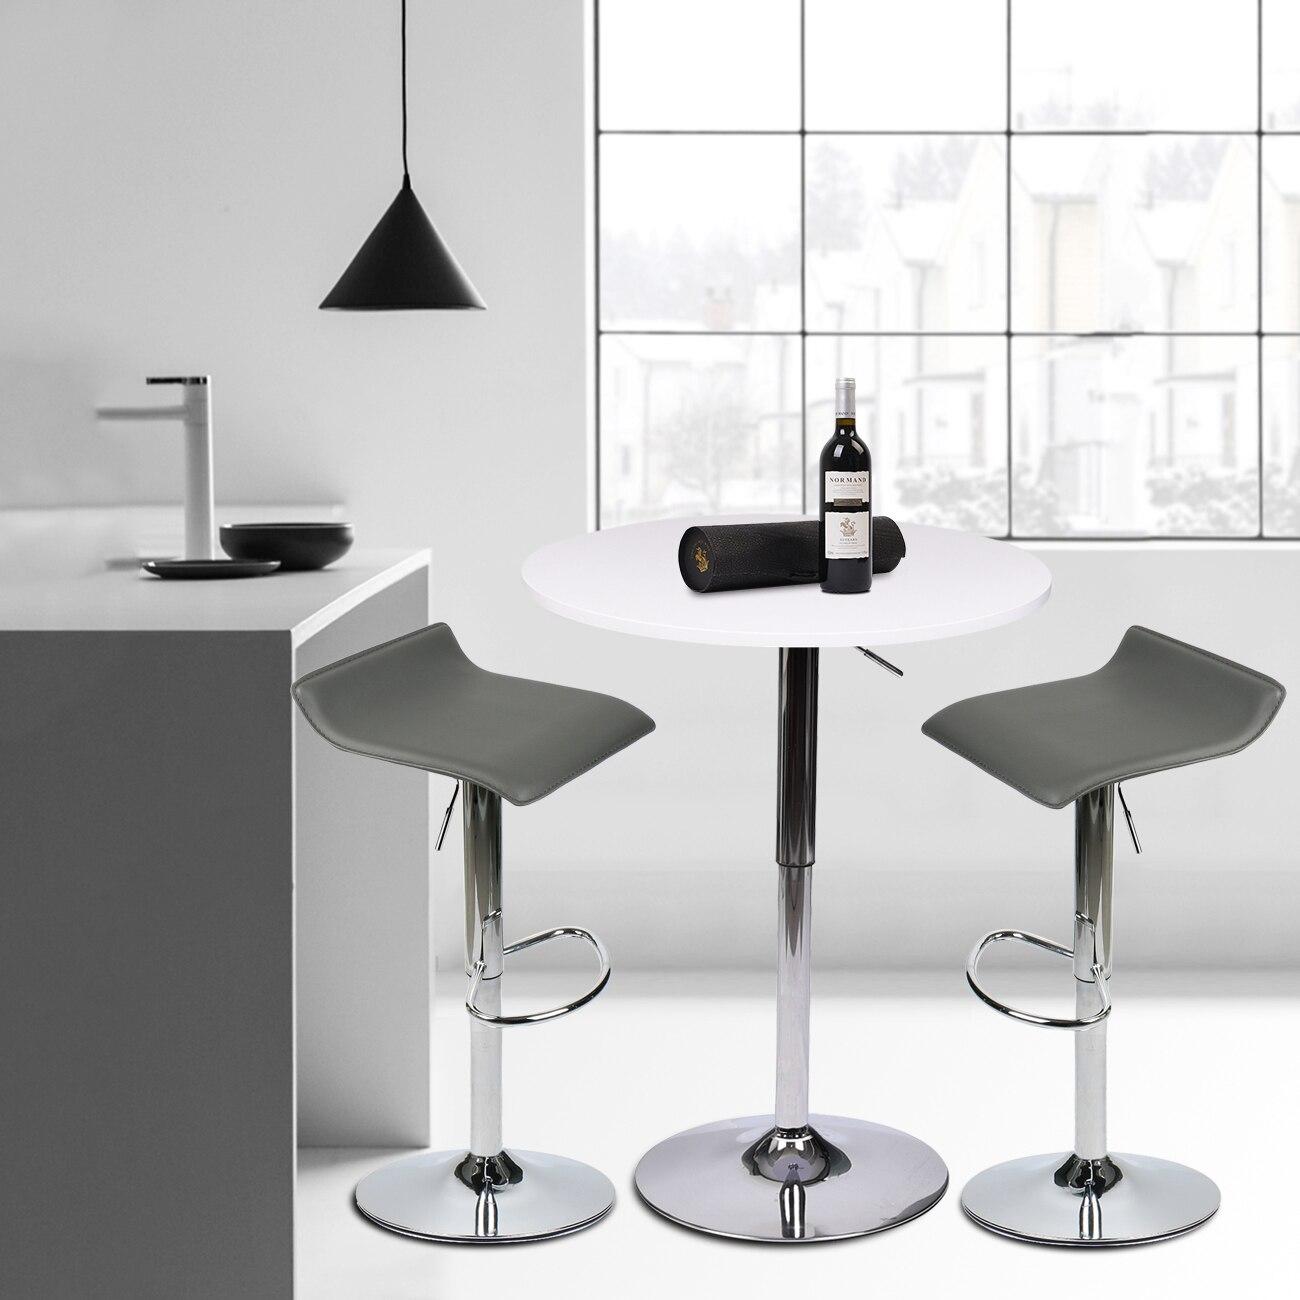 Modern 3 Pcs Bar Table Set W/ 2 Bar Stool PU Leather Hydraulic Counter Chair